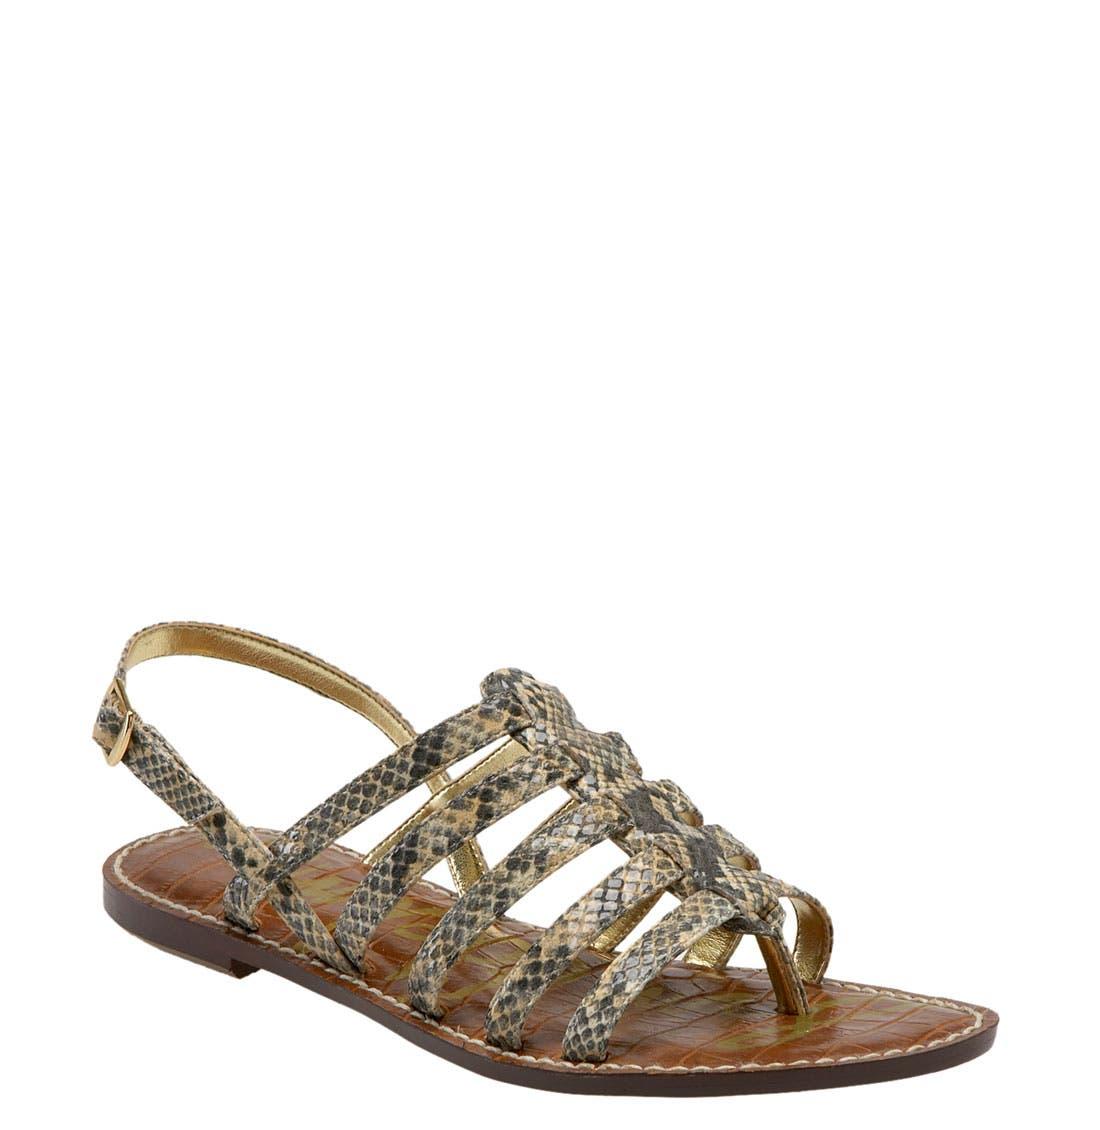 Alternate Image 1 Selected - Sam Edelman 'Hamilton' Sandal